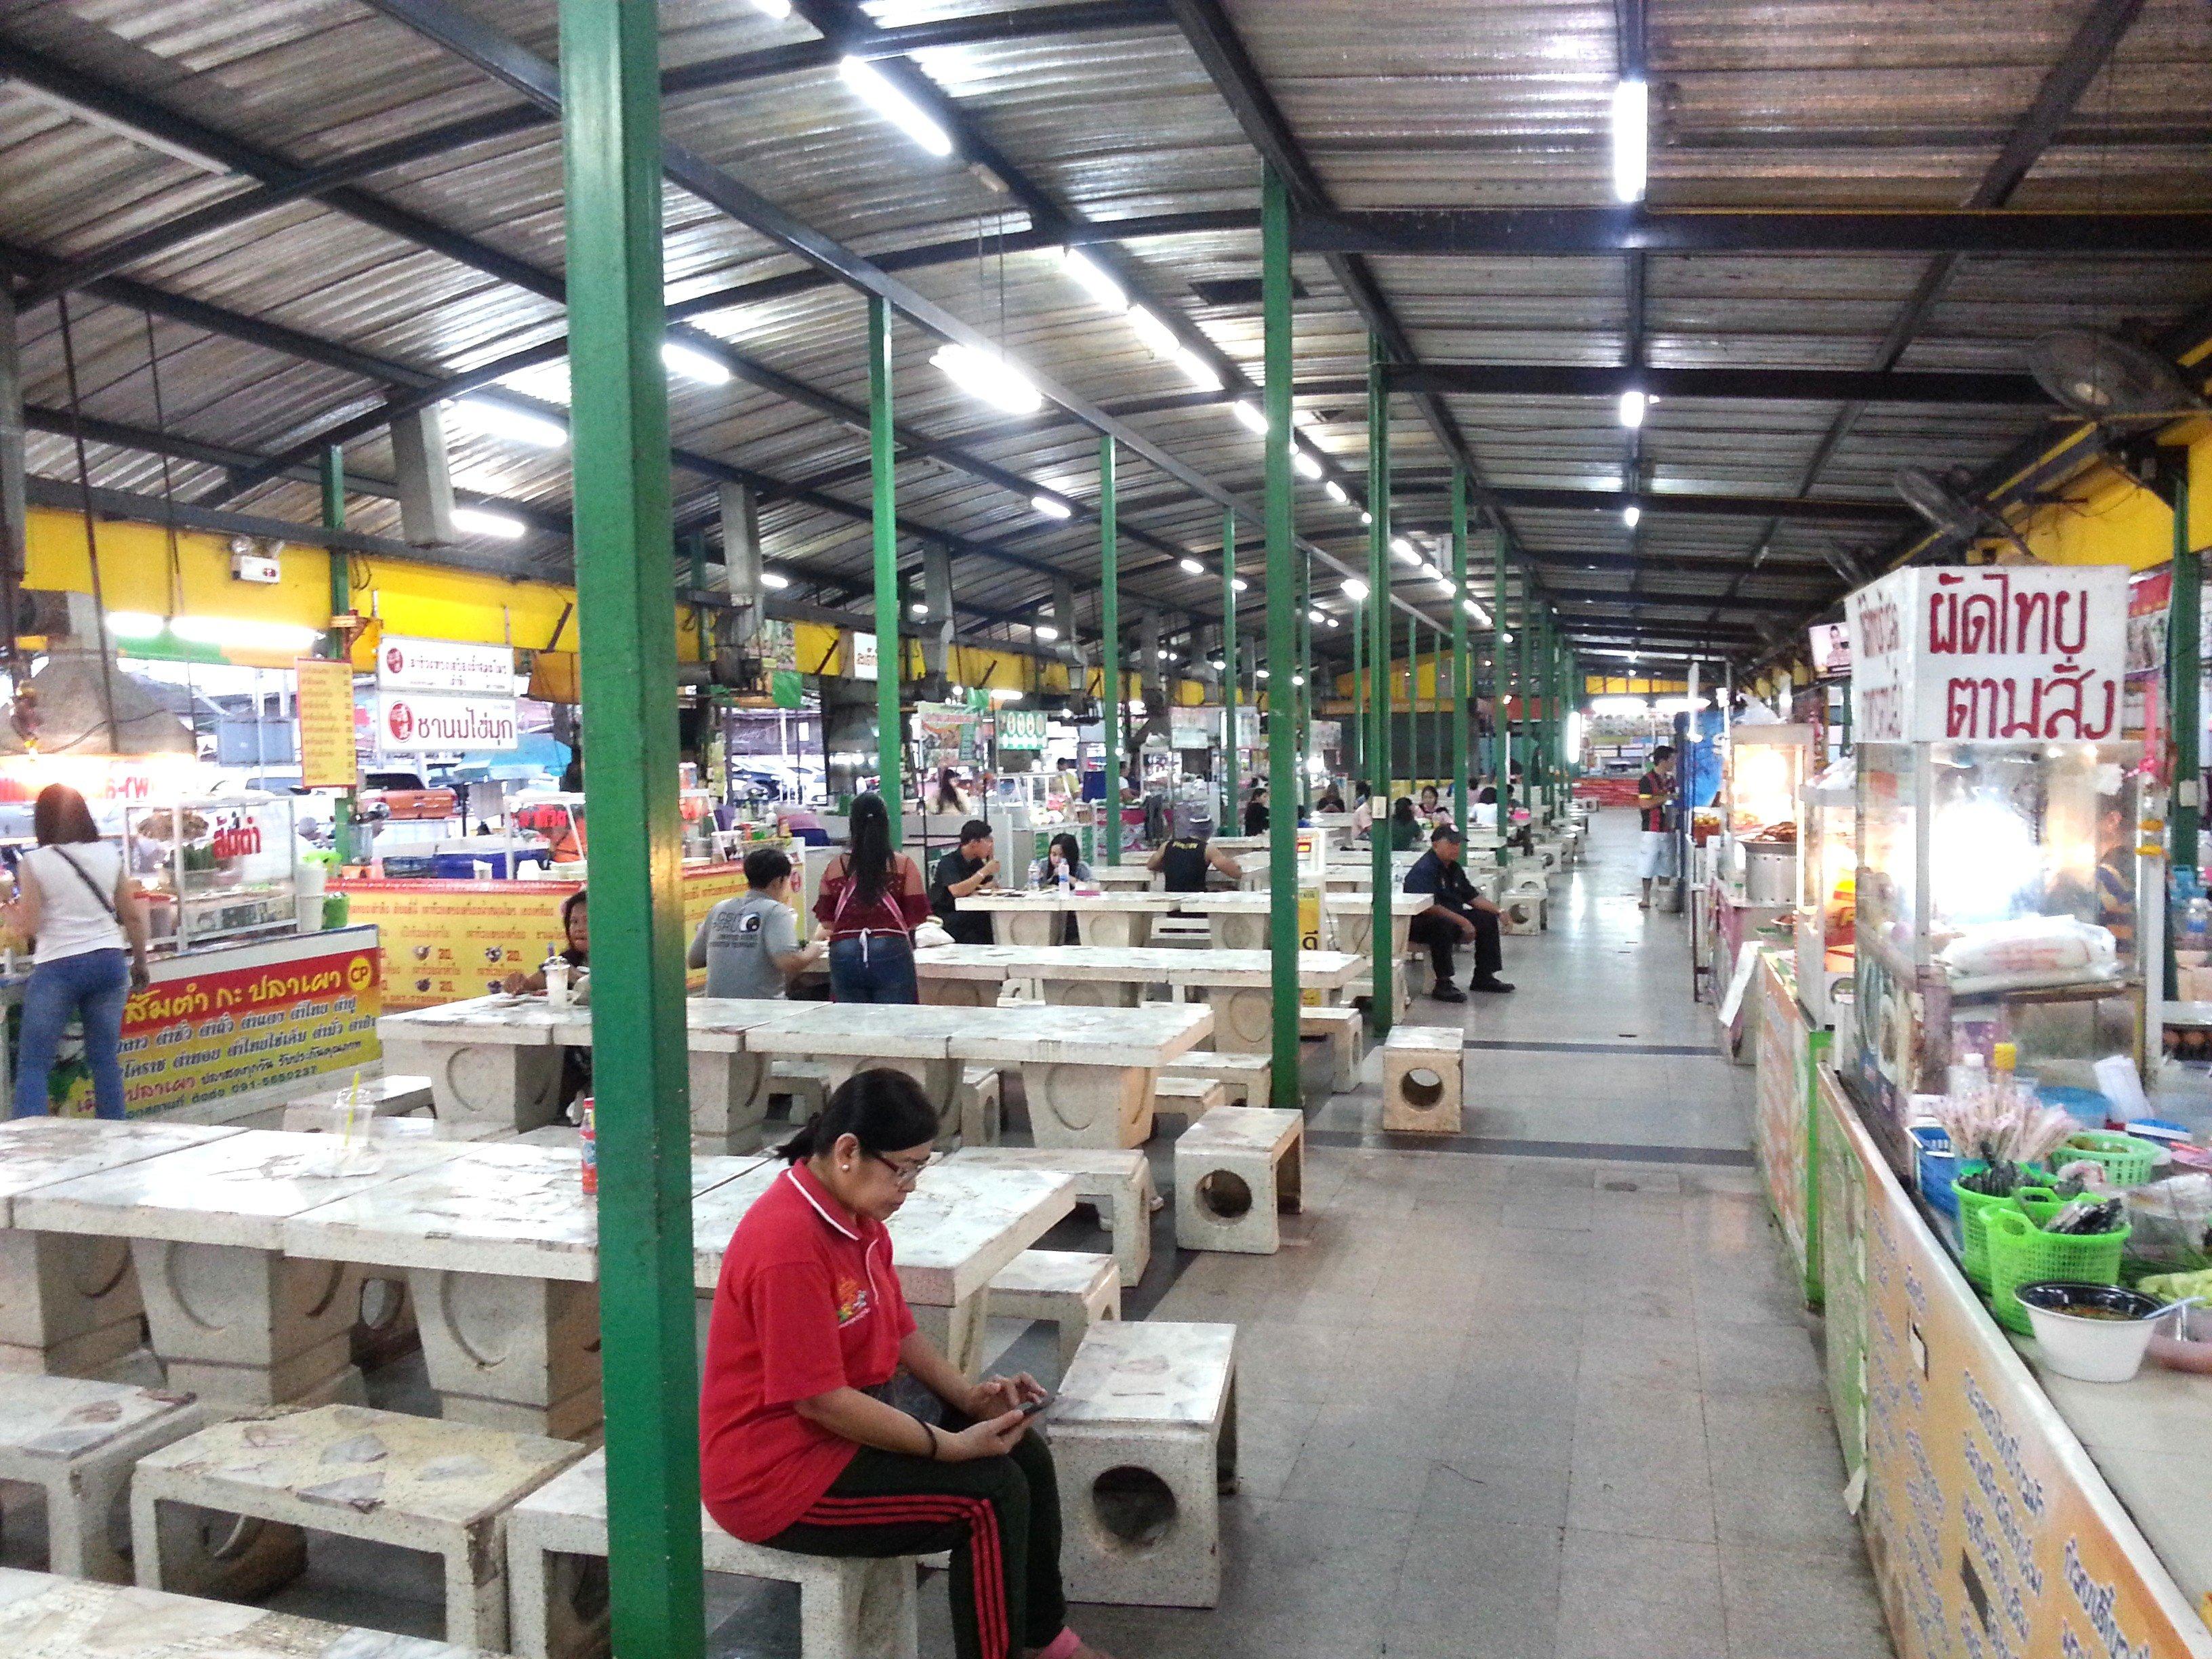 Food stalls at Udon Thani Night Market